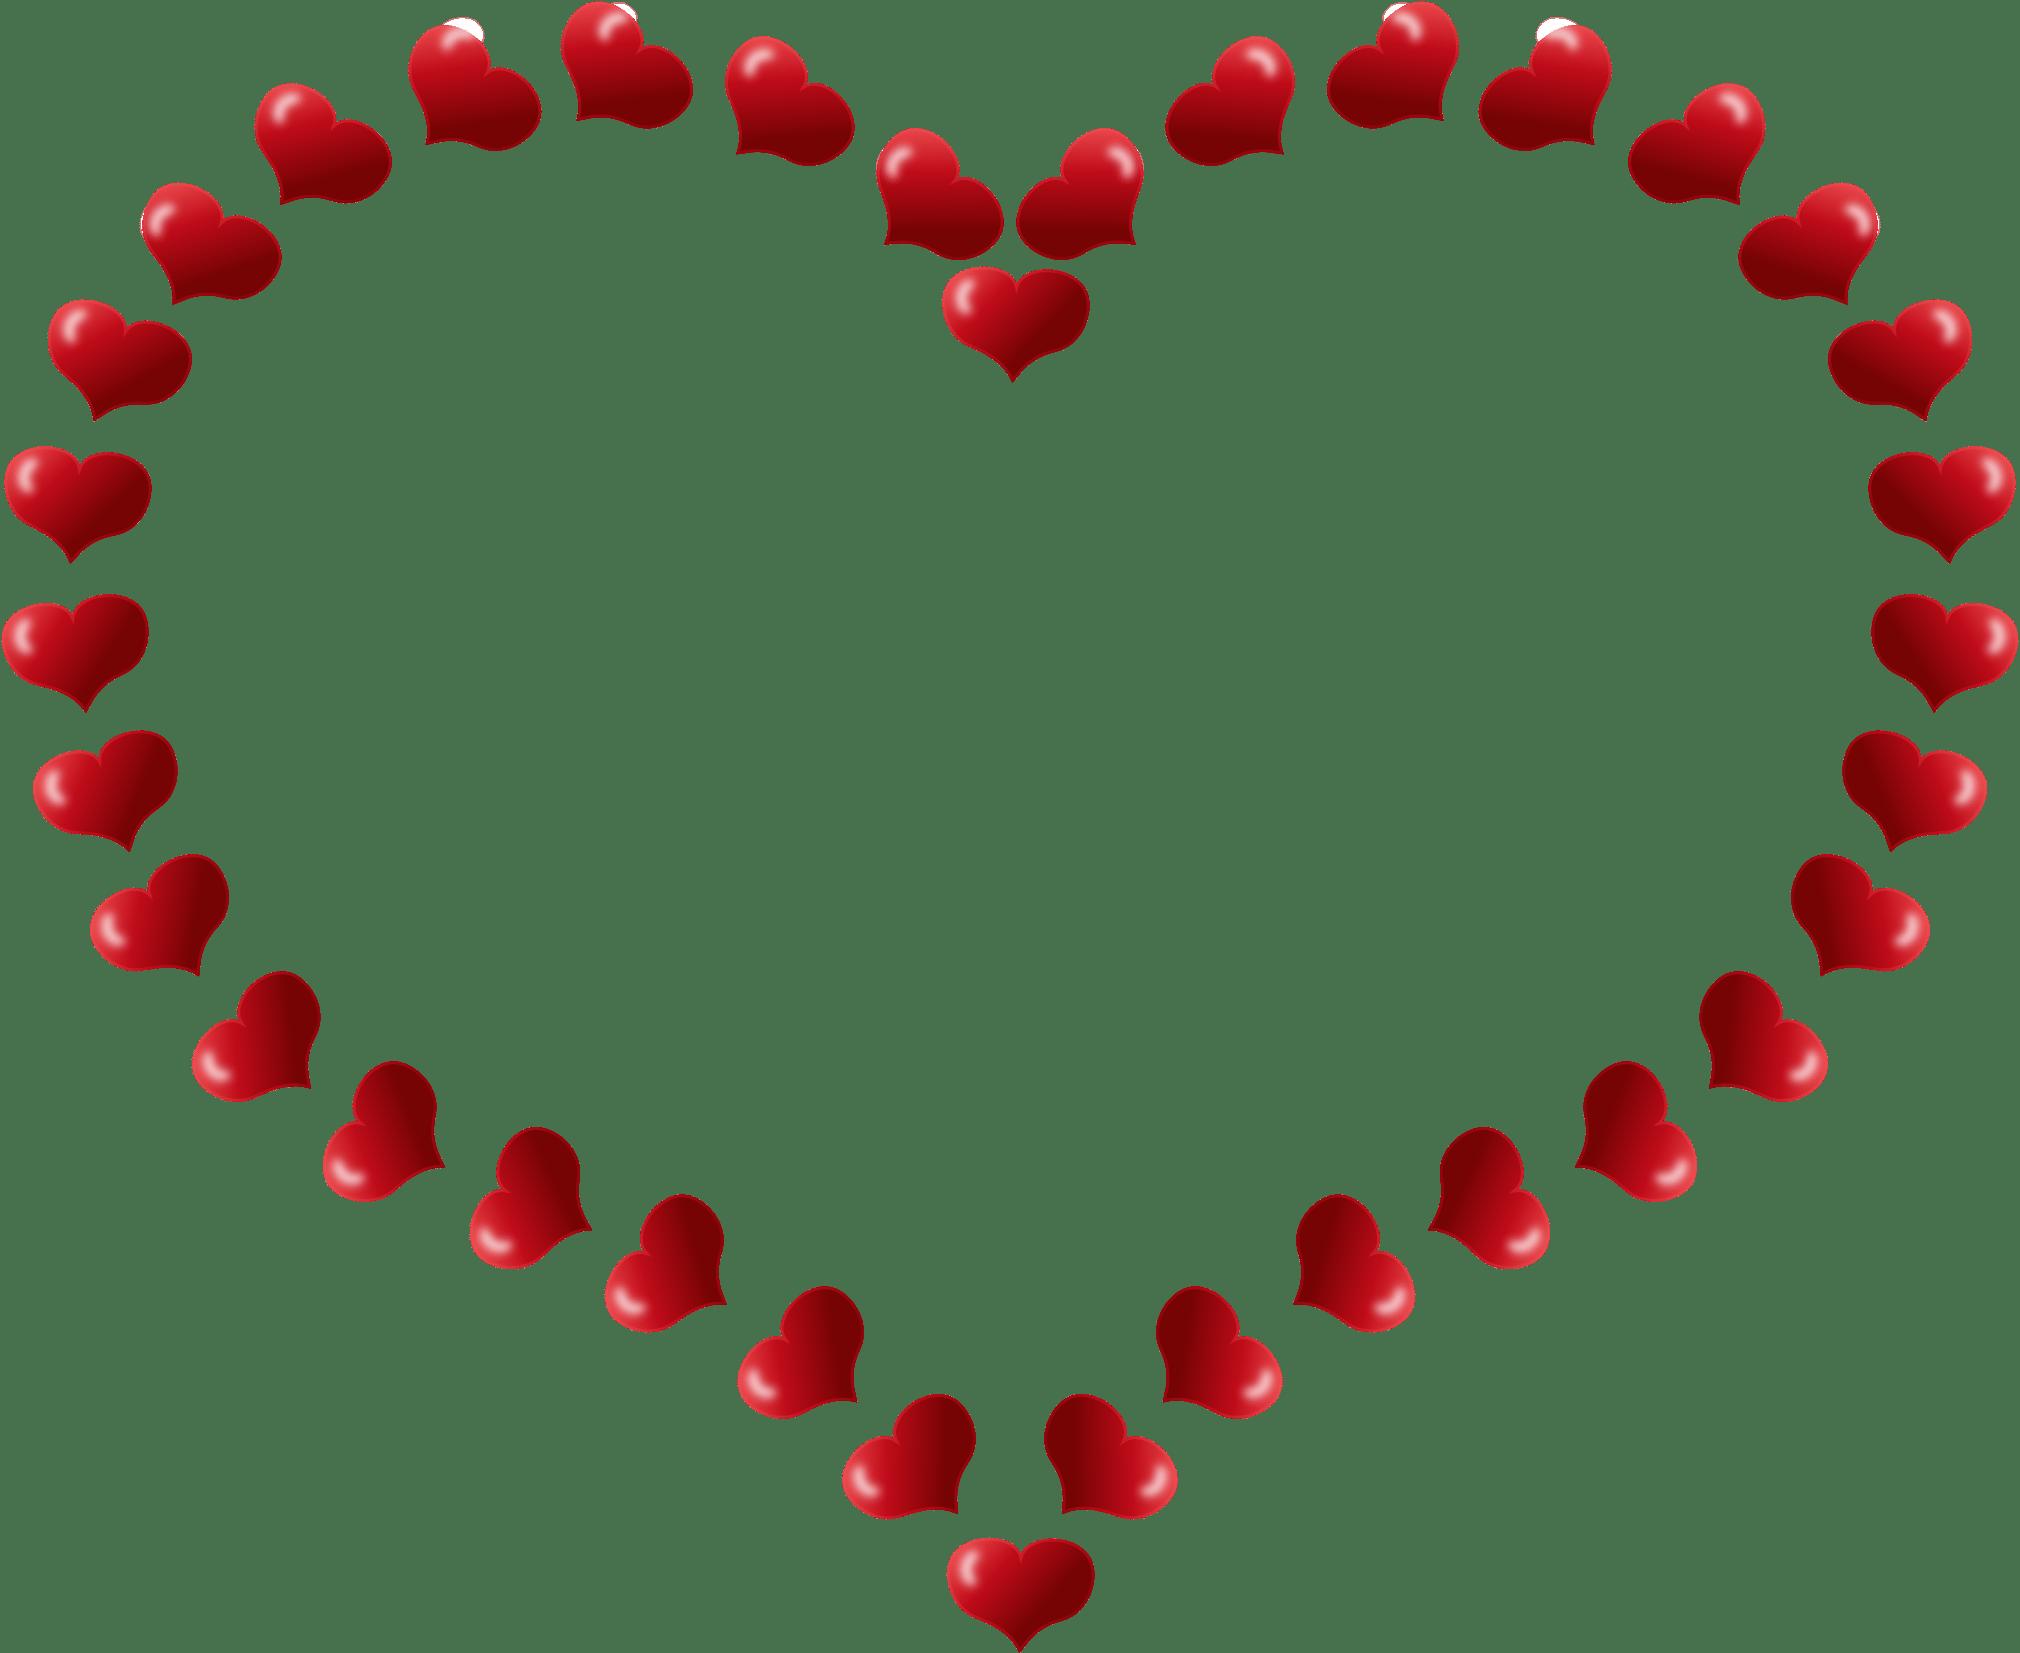 2020x1653 Heart Outline Stars Transparent Png